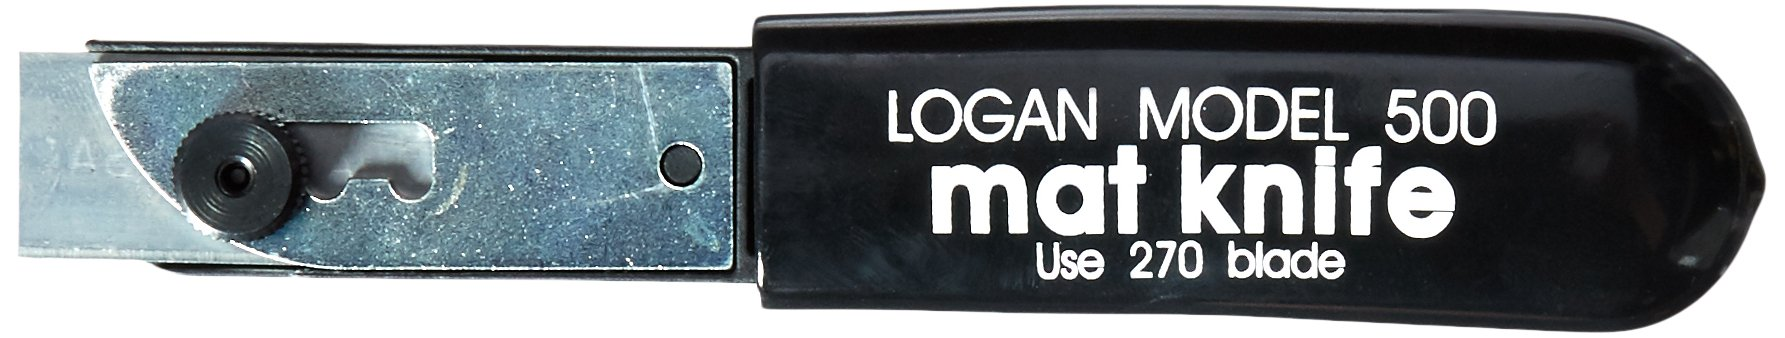 Logan 500 Model Mat Knife For Framing and Matting-Professional or At-Home Framing